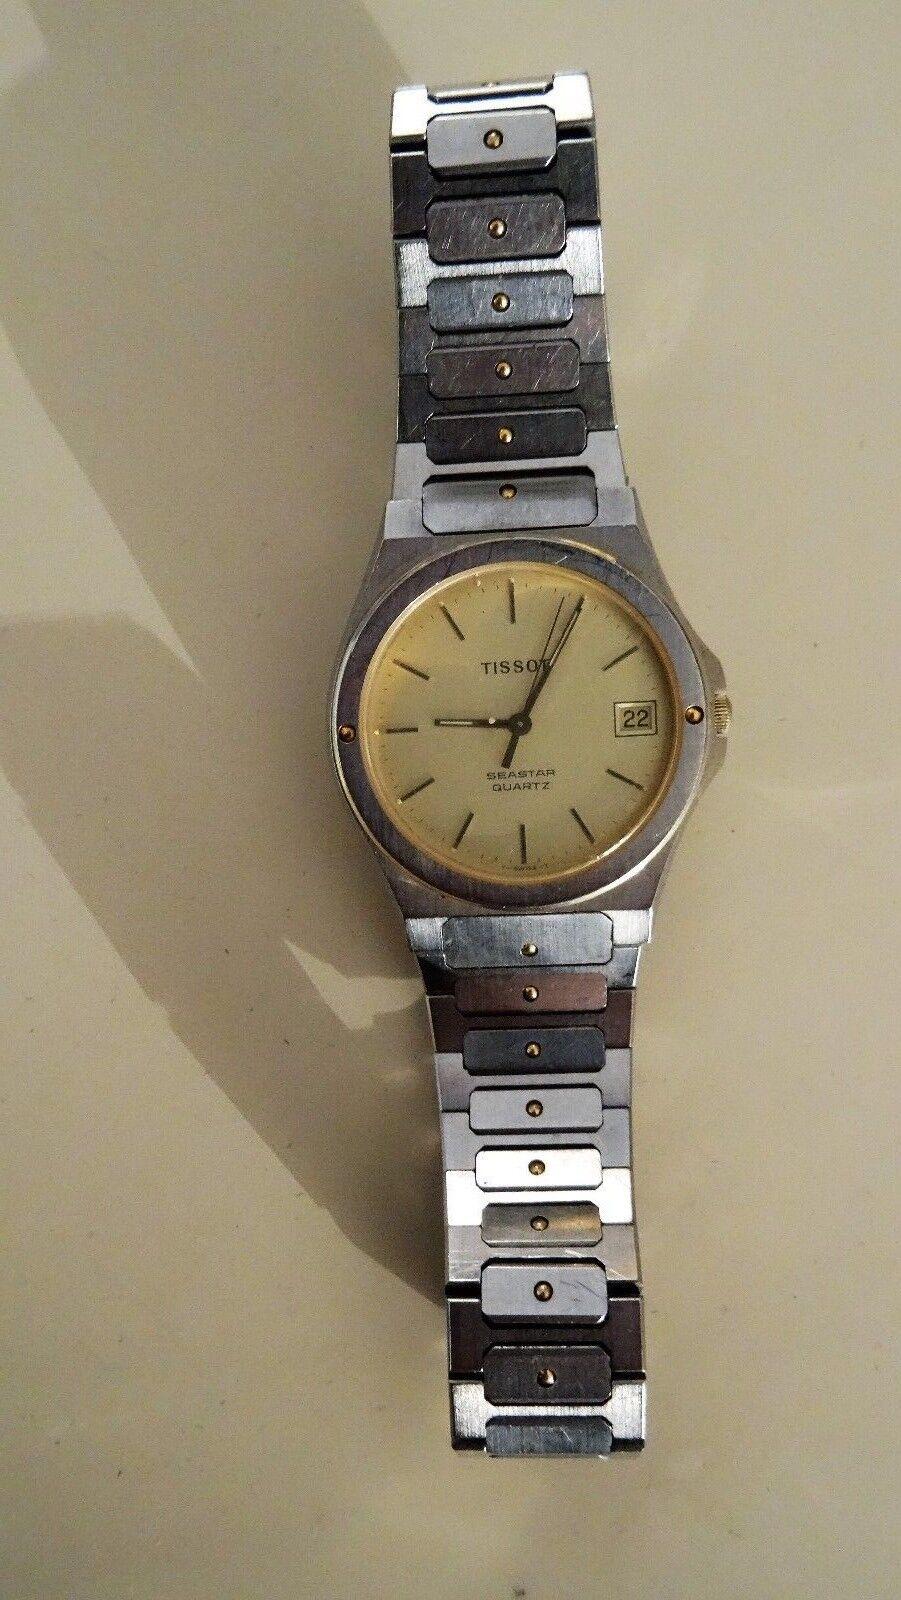 TISSOT Seastar - Orologio Uomo meccanico Vintage Uomo Svizzera Watch 60's